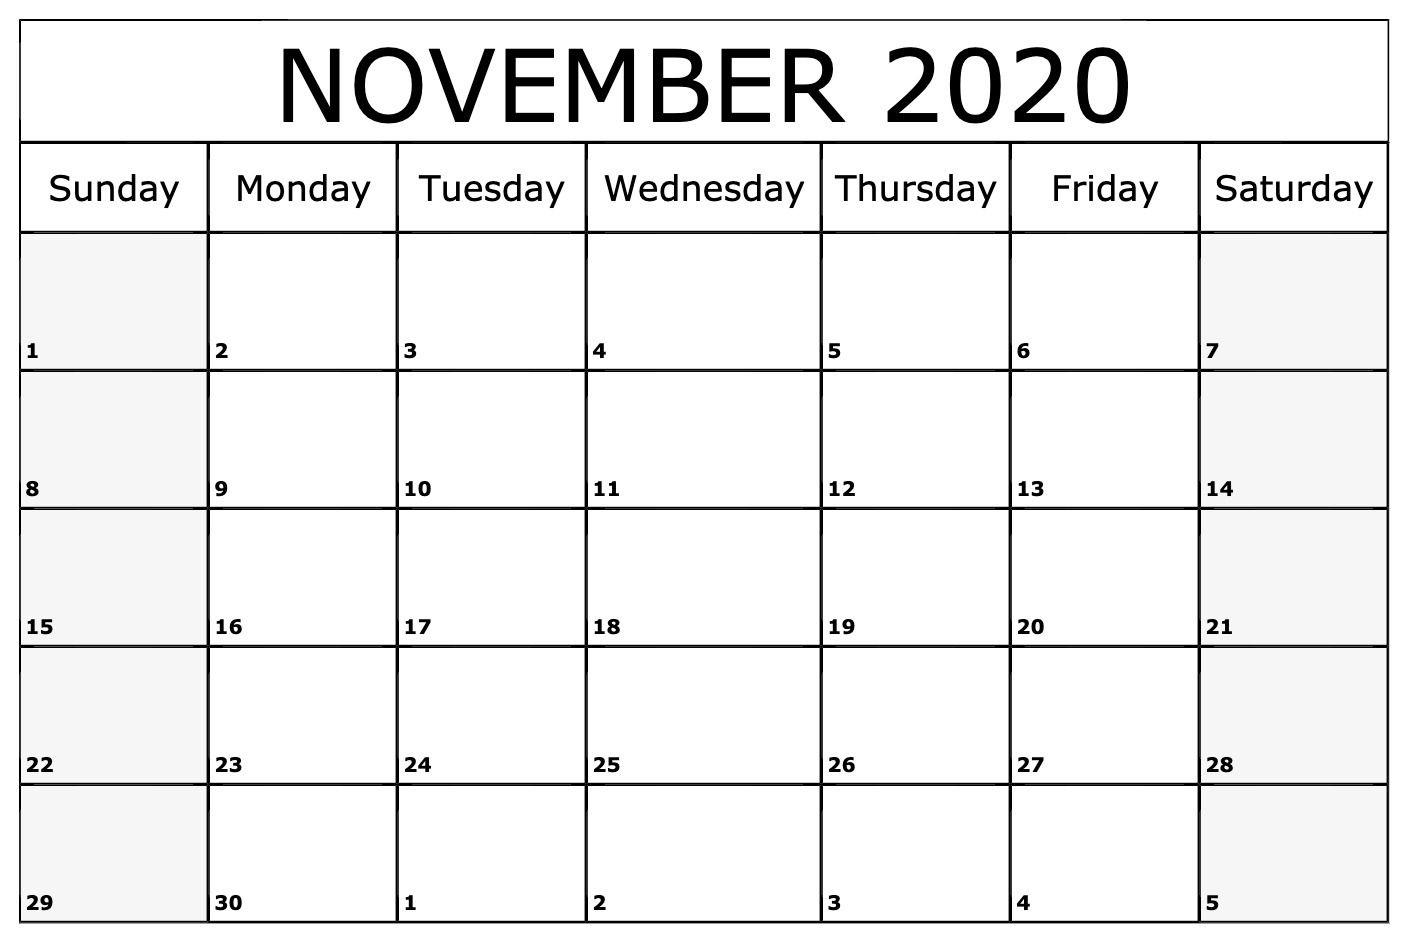 Free Printable November 2020 Calendar Template – Pdf, Word